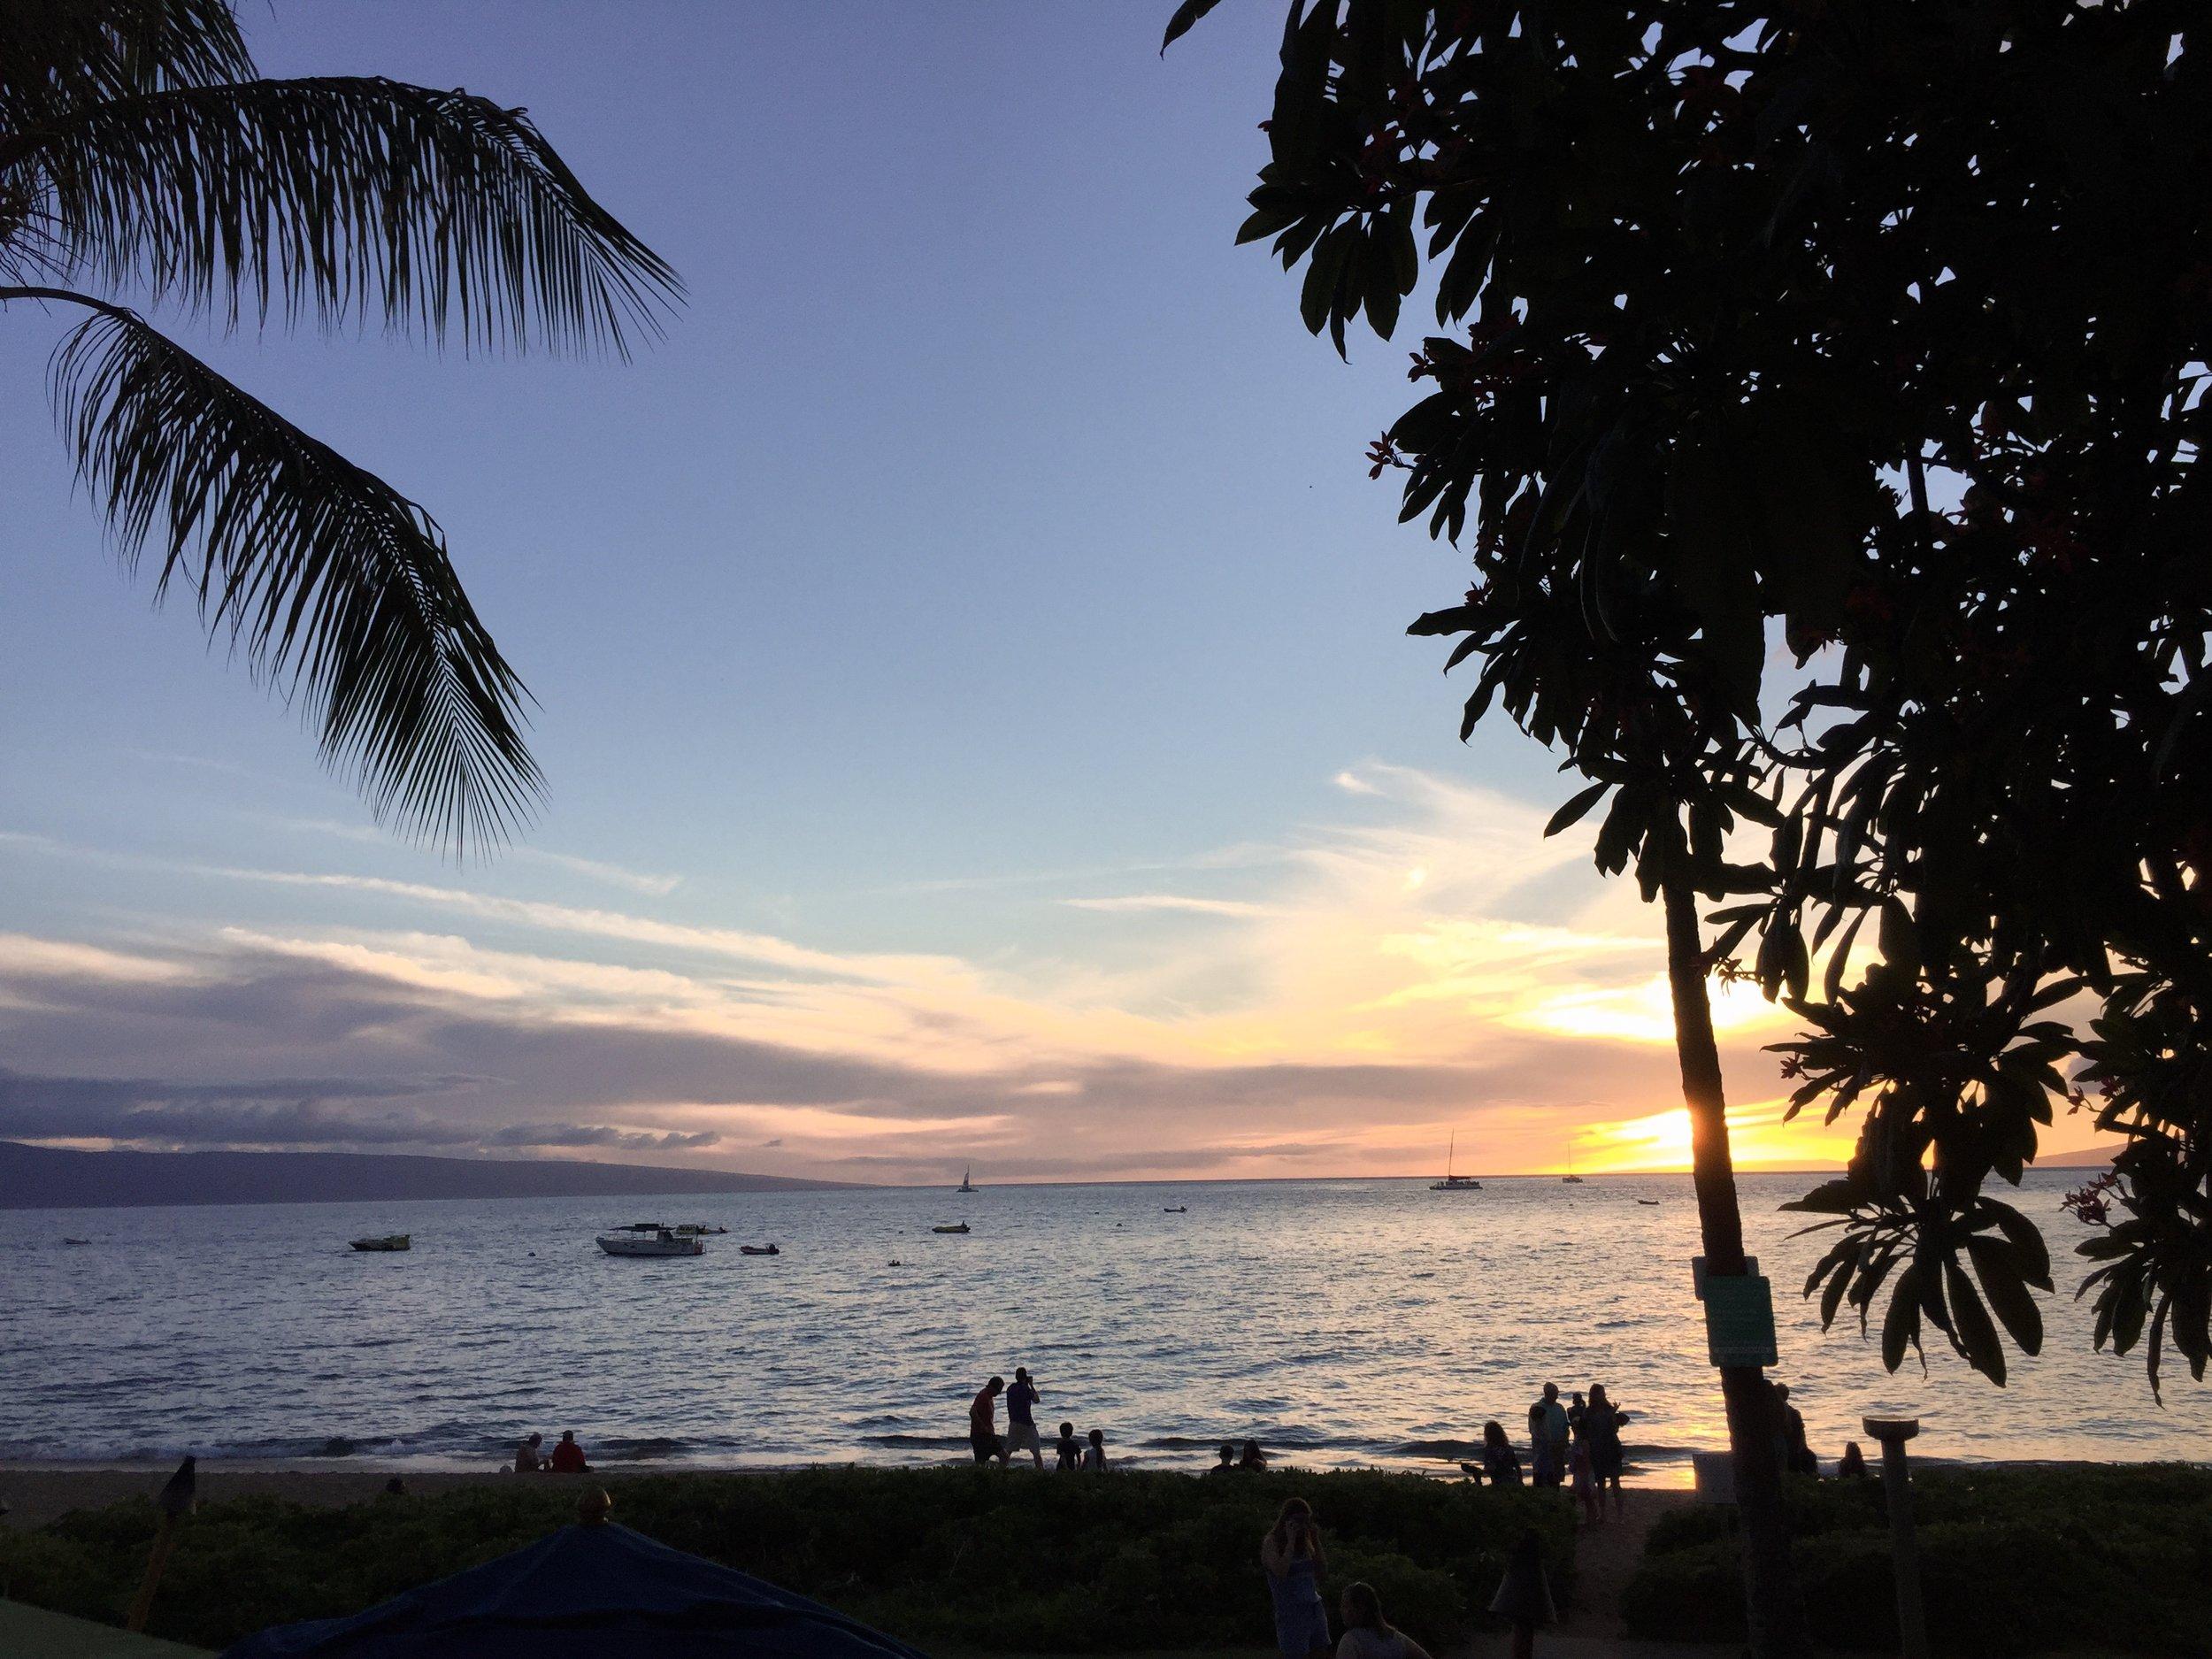 maui sunset palm tree ocean beach sailboat